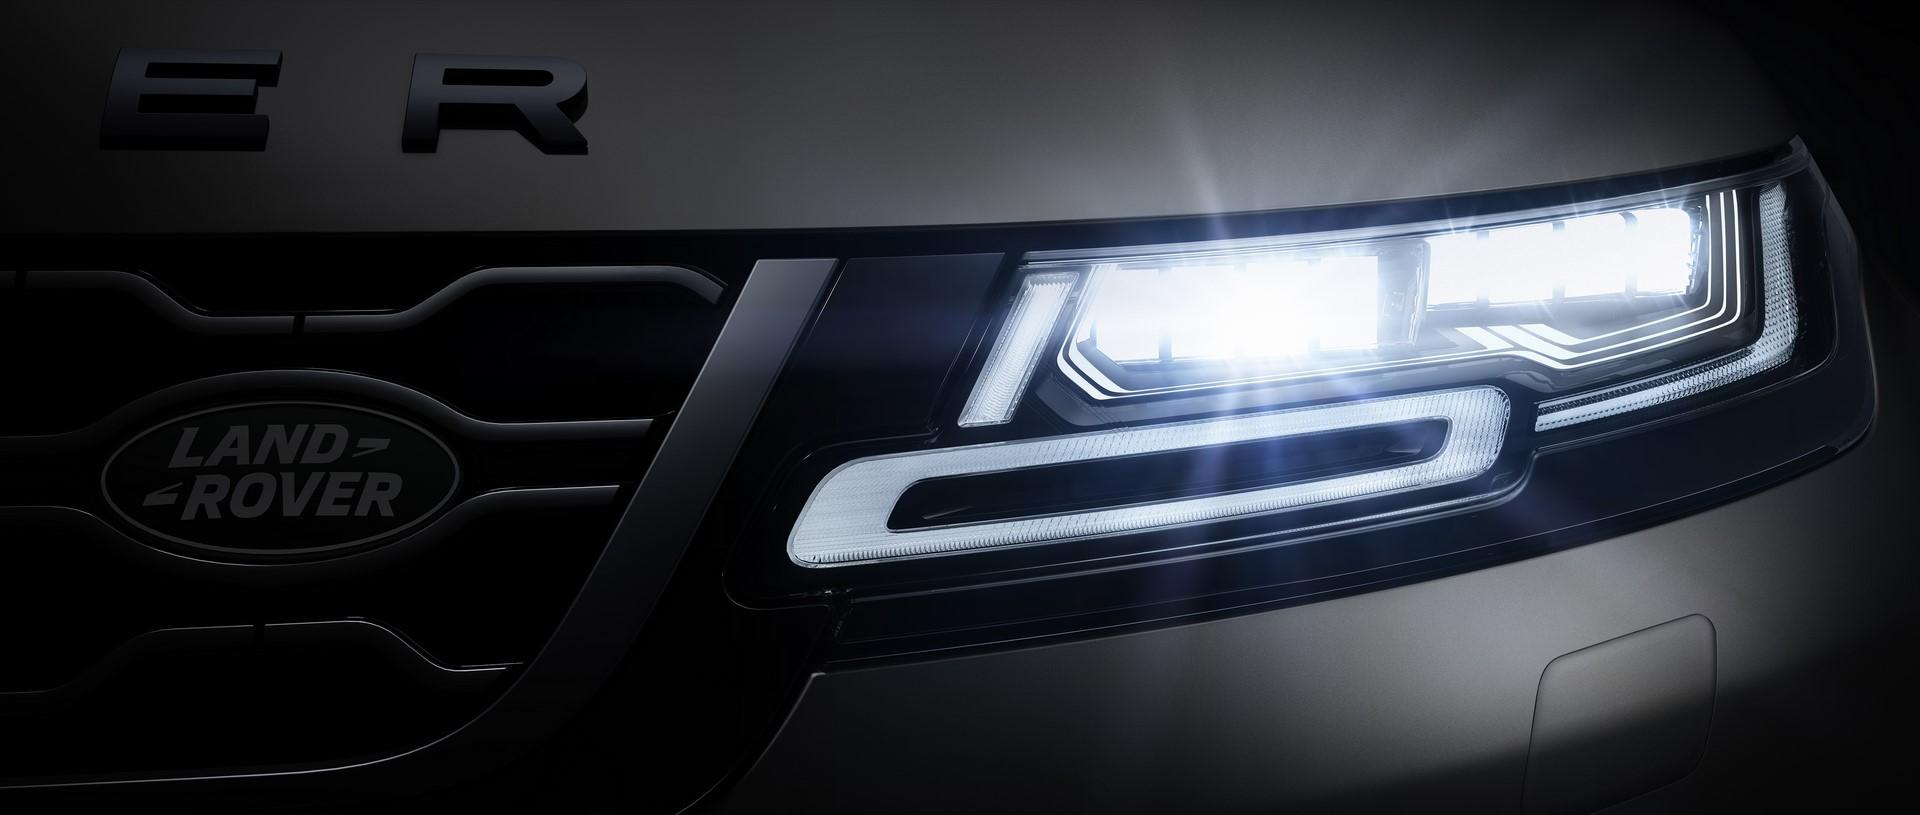 Range Rover Evoque 2019 (26)